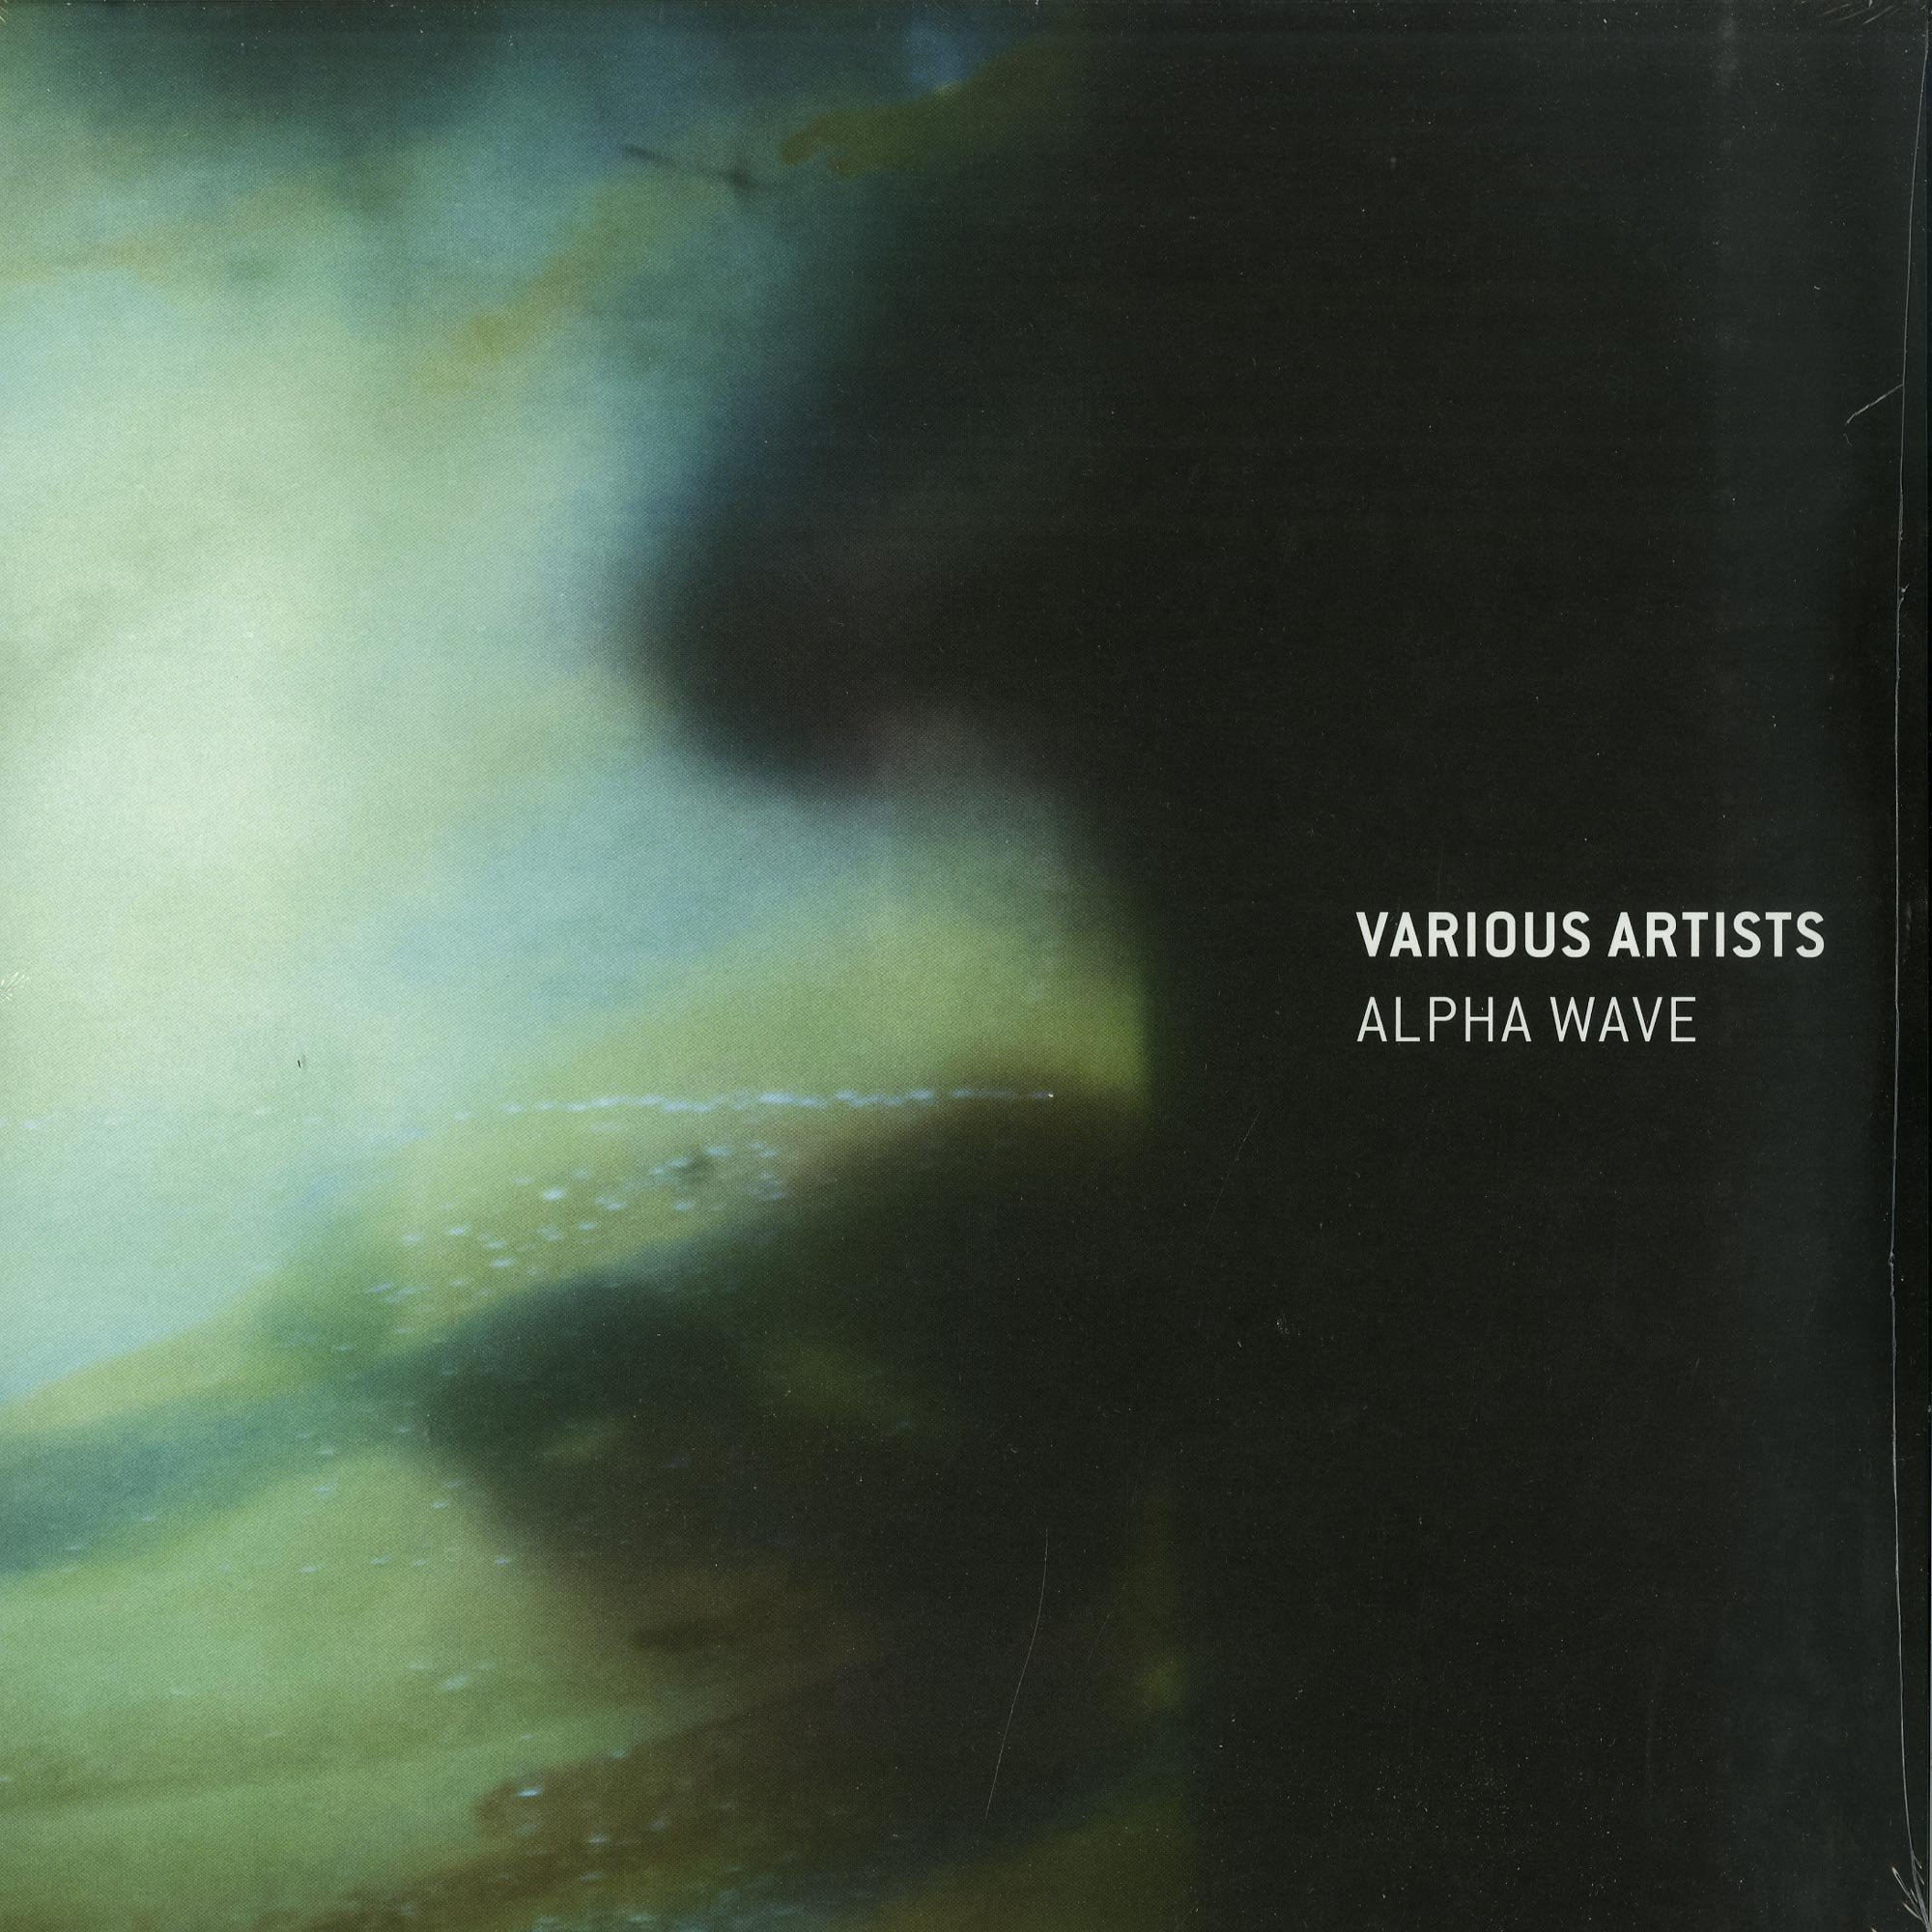 Various Artists - ALPHA WAVE